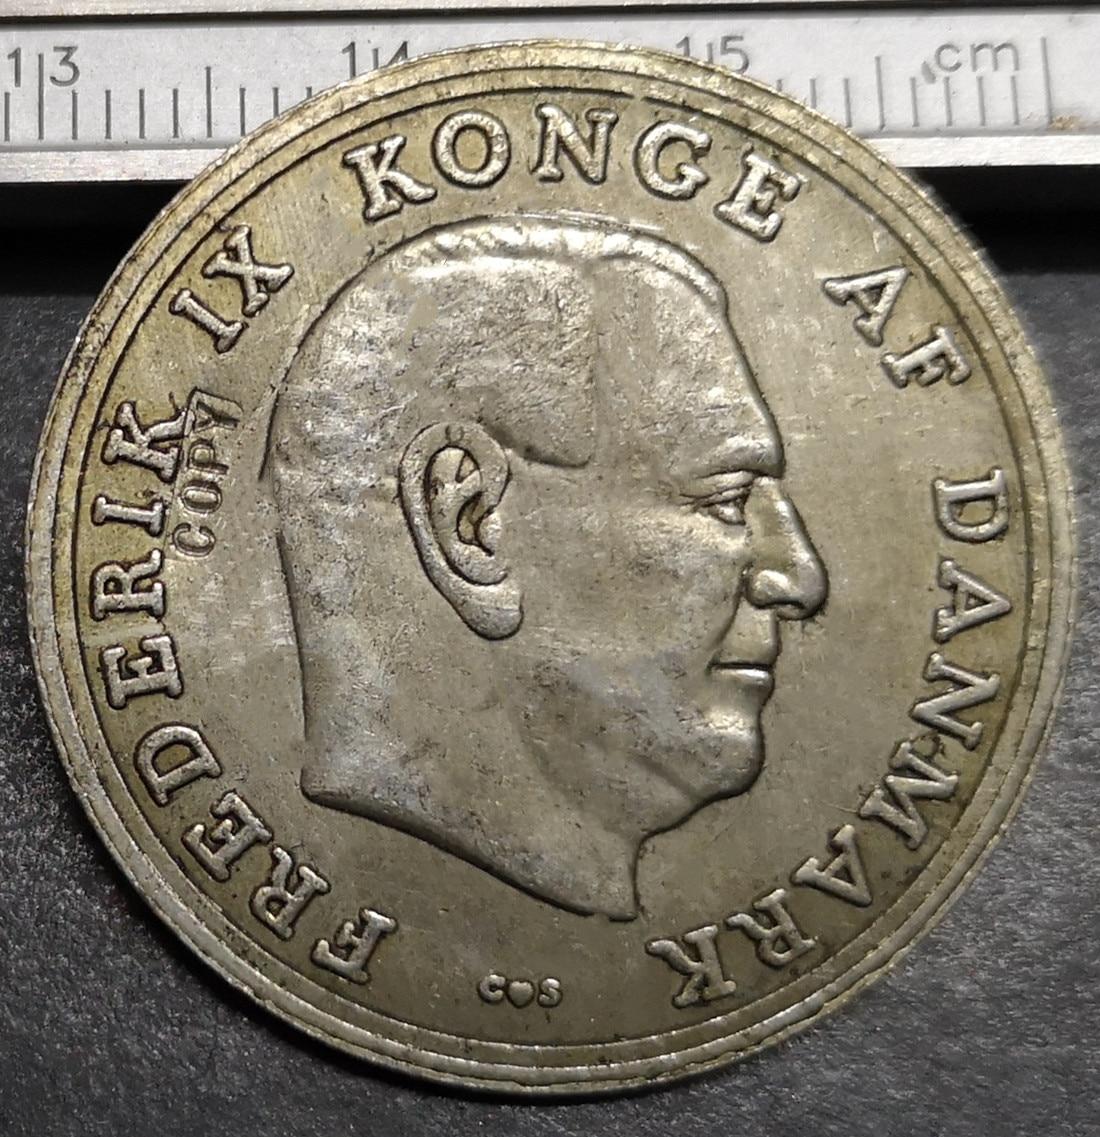 1964 Dinamarca 5 Kroner-Frederik IX (Casamento de Anne-Marie) de Prata Banhado A Coin Copy